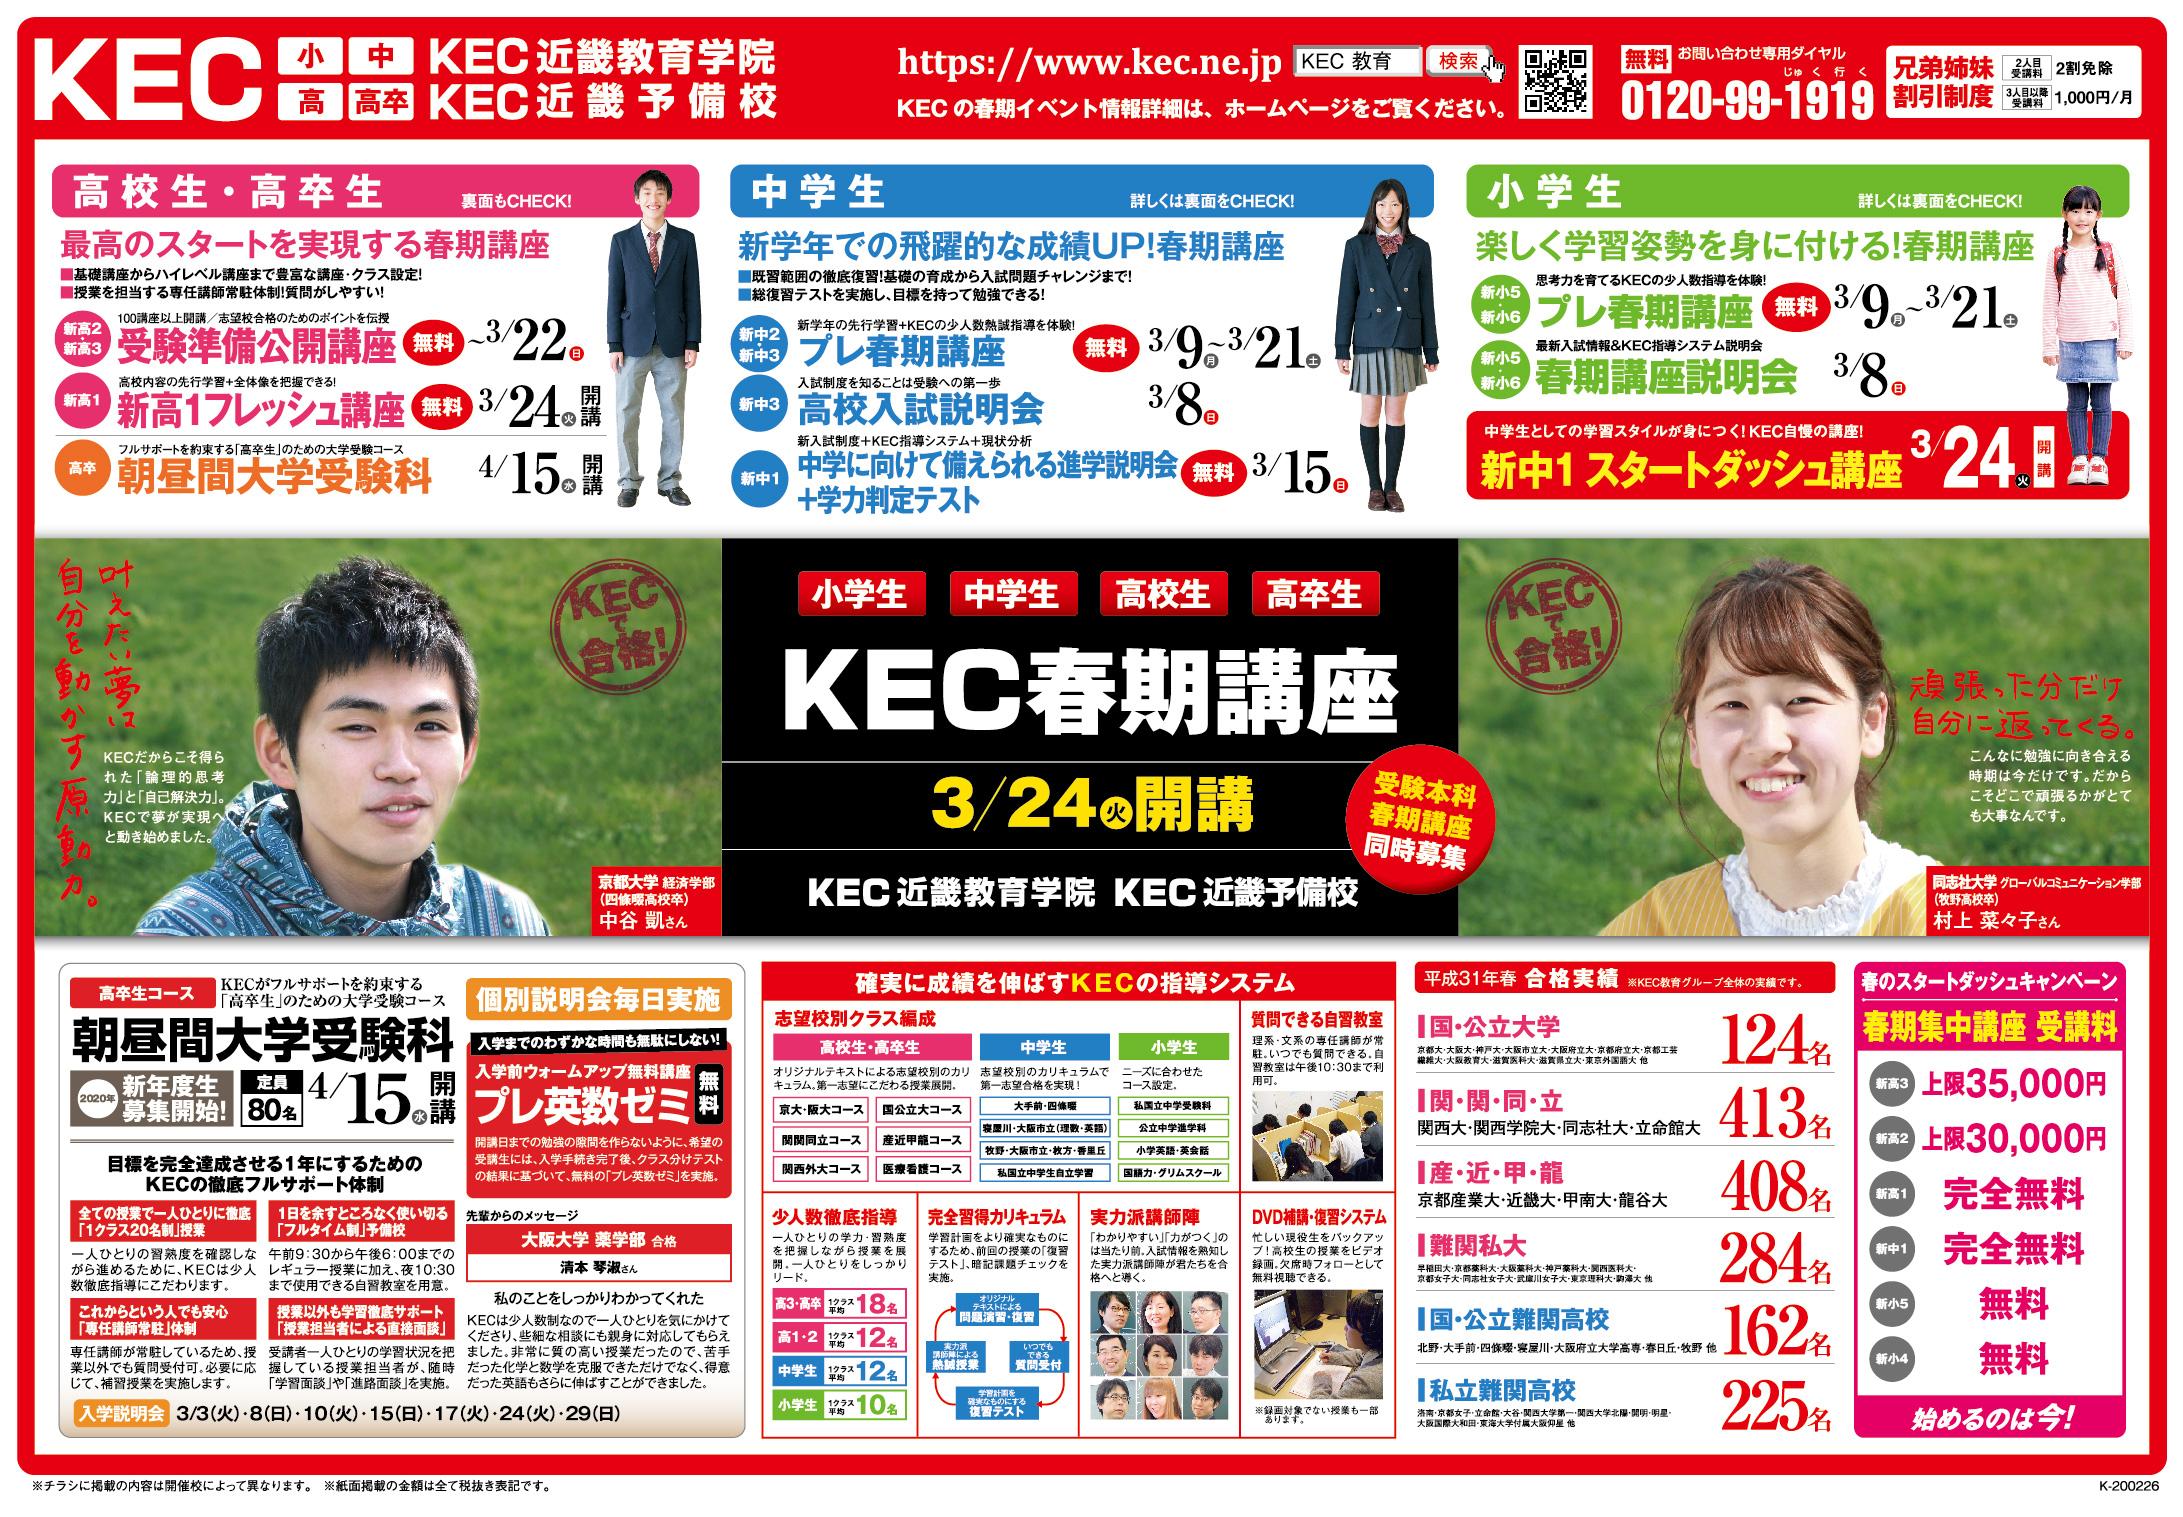 KEC教育_塾予備校_200214春期チラシ第5弾_京阪_表